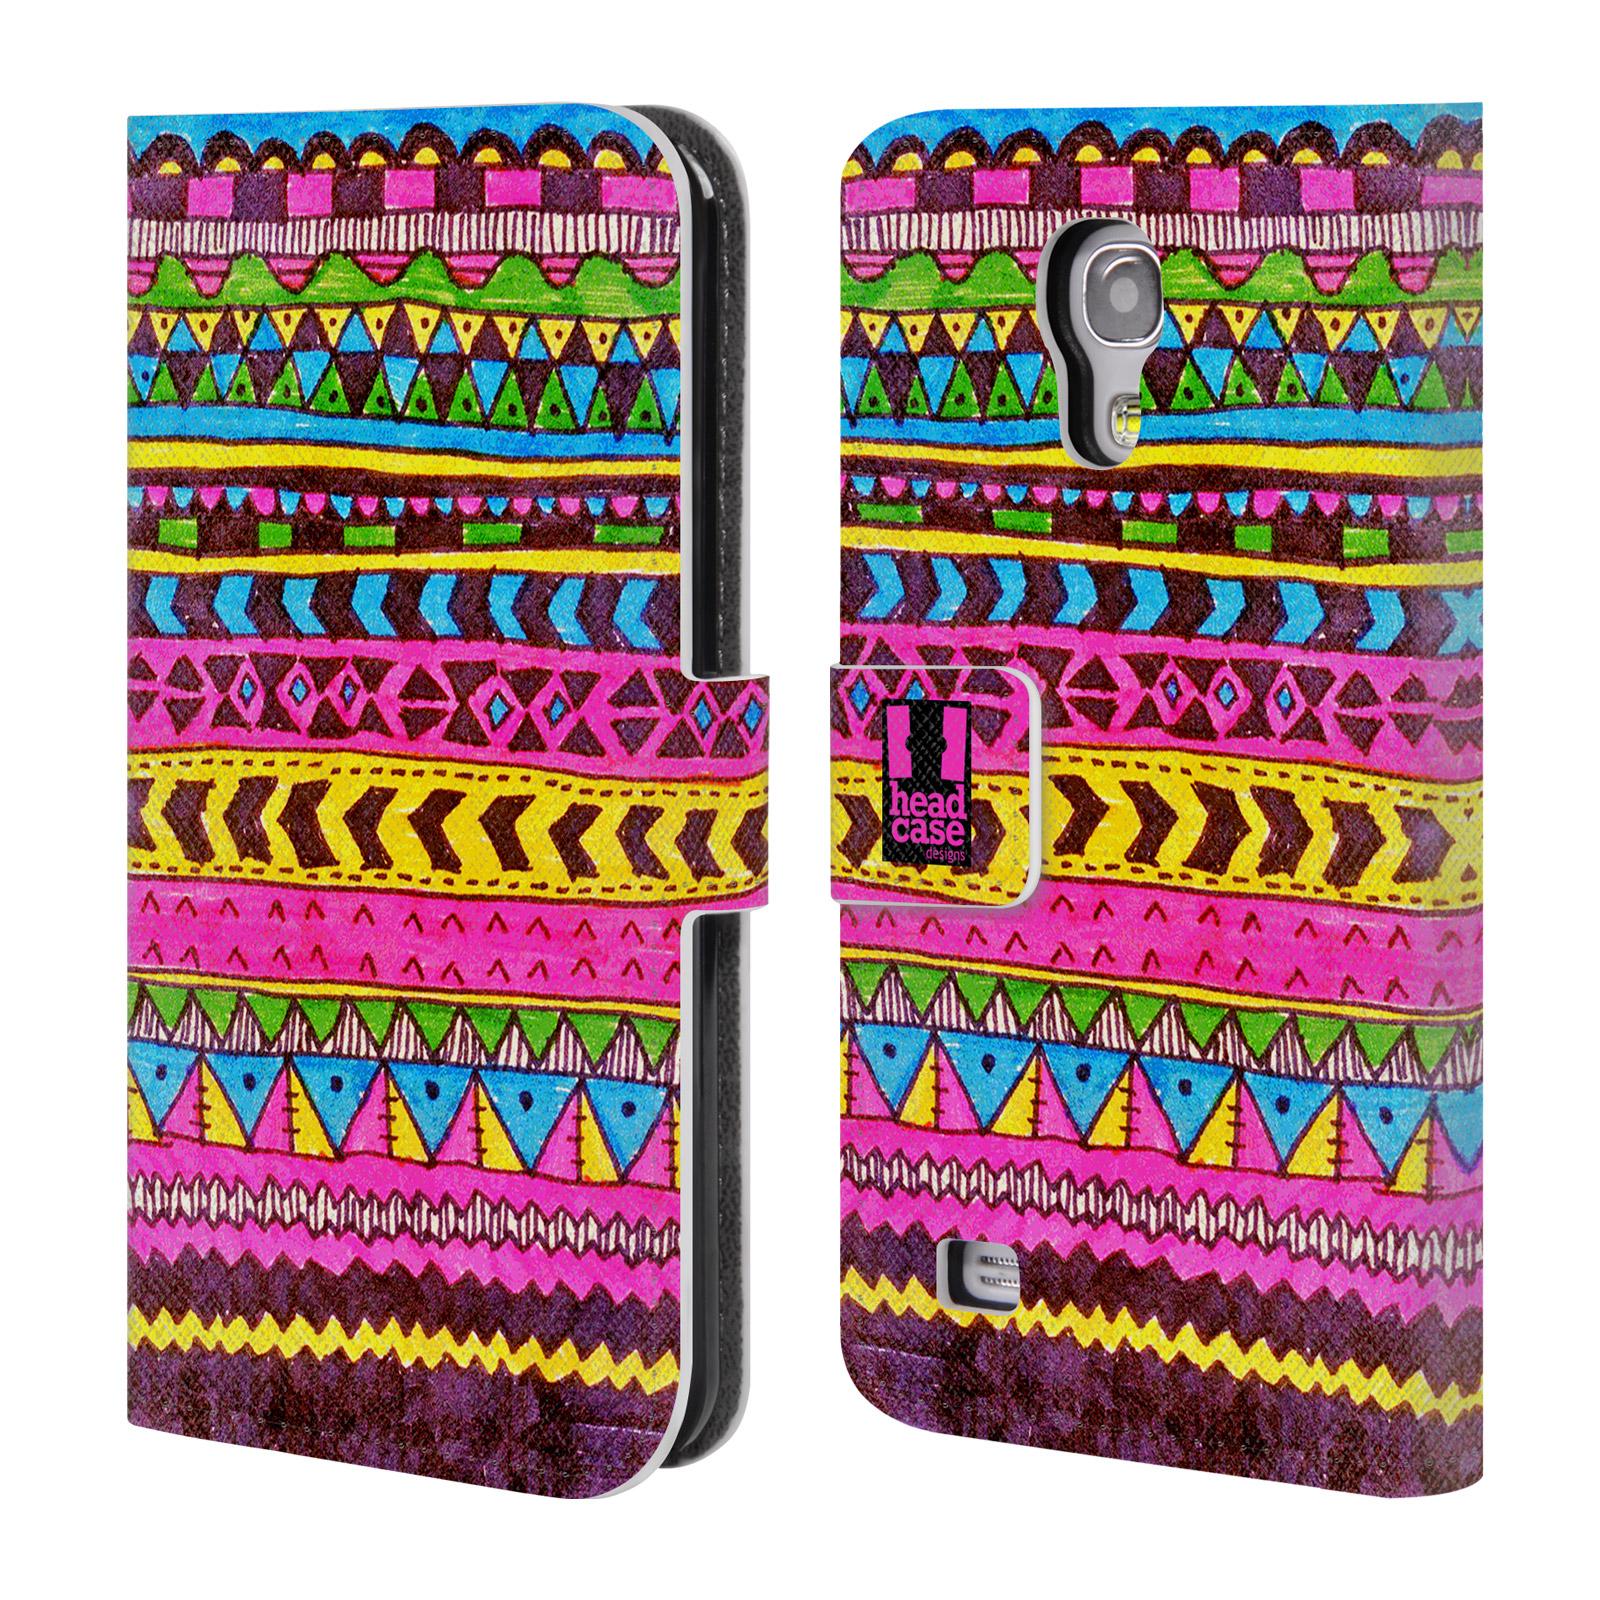 HEAD CASE Flipové pouzdro pro mobil Samsung Galaxy S4 MINI / S4 MINI DUOS Barevná aztécká čmáranice růžová